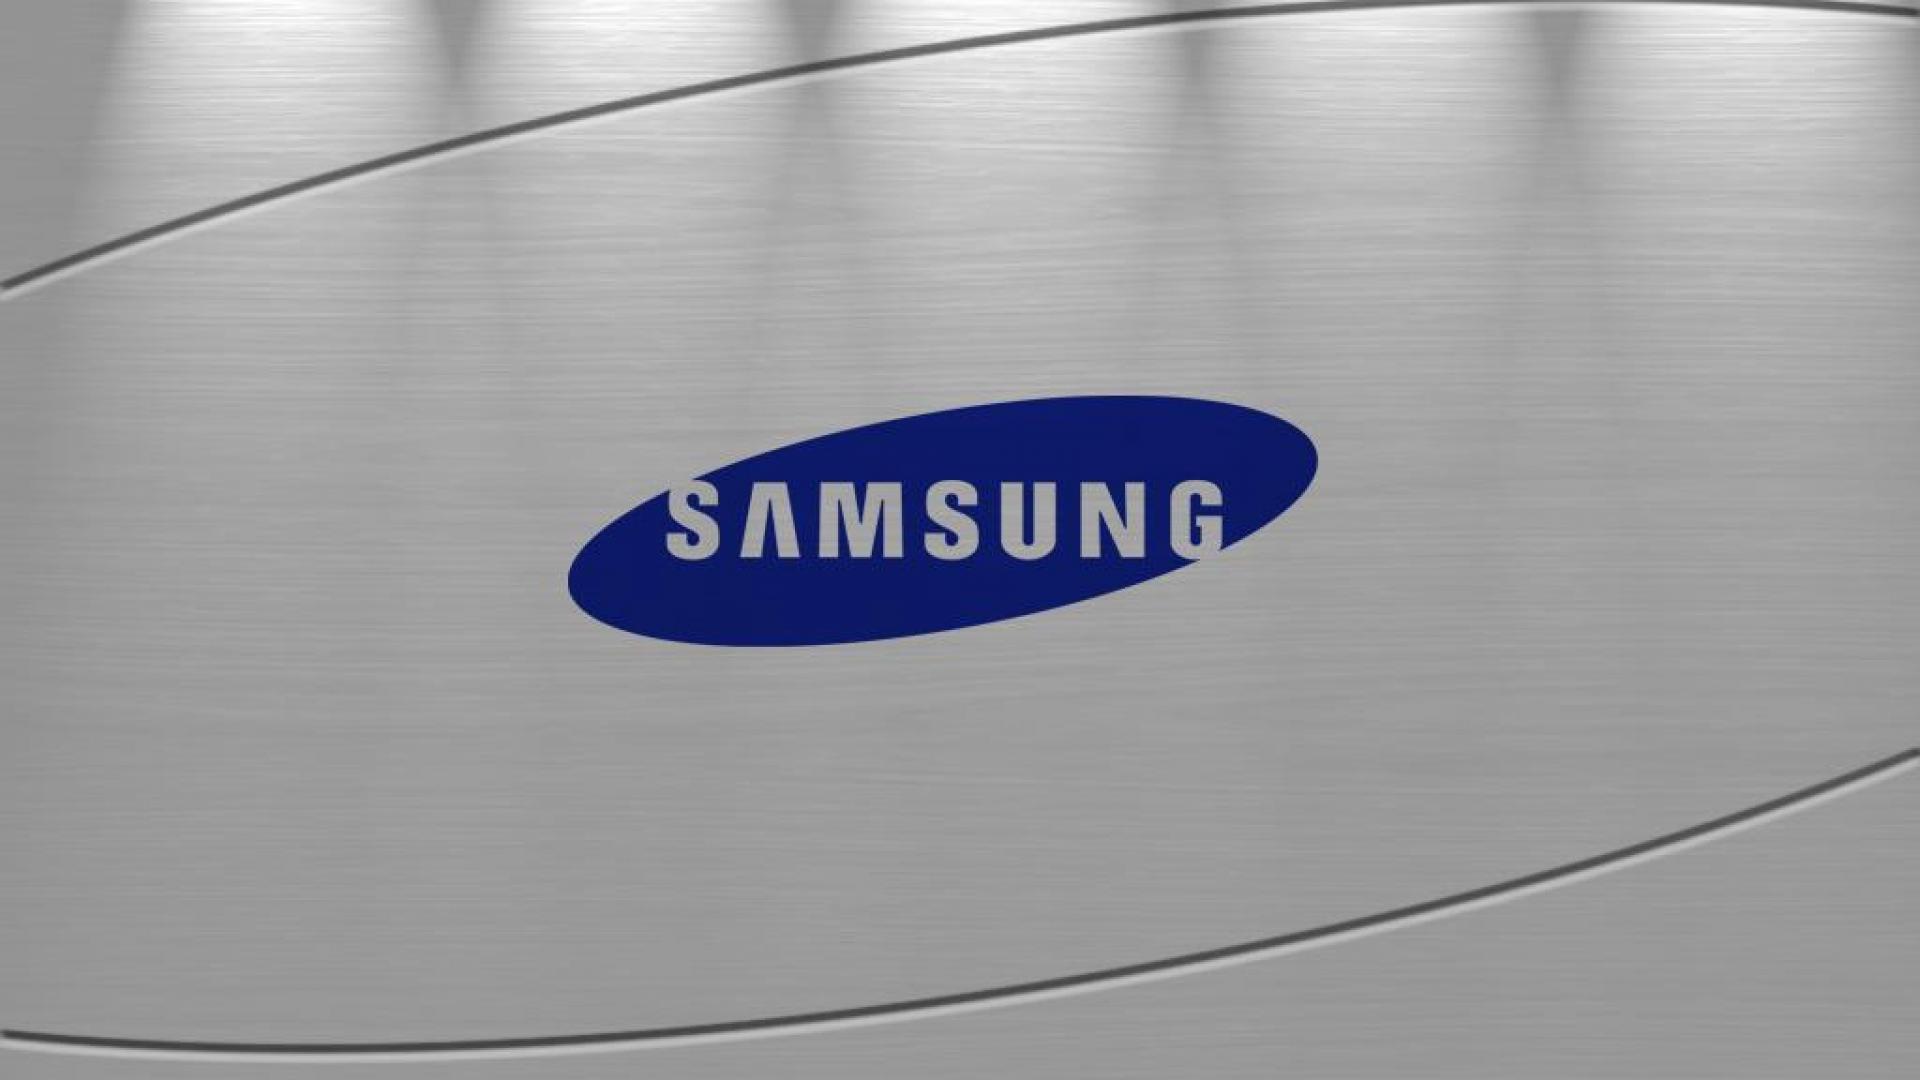 Galaxy S5 Fall Wallpaper Samsung Logo Wallpapers Pixelstalk Net